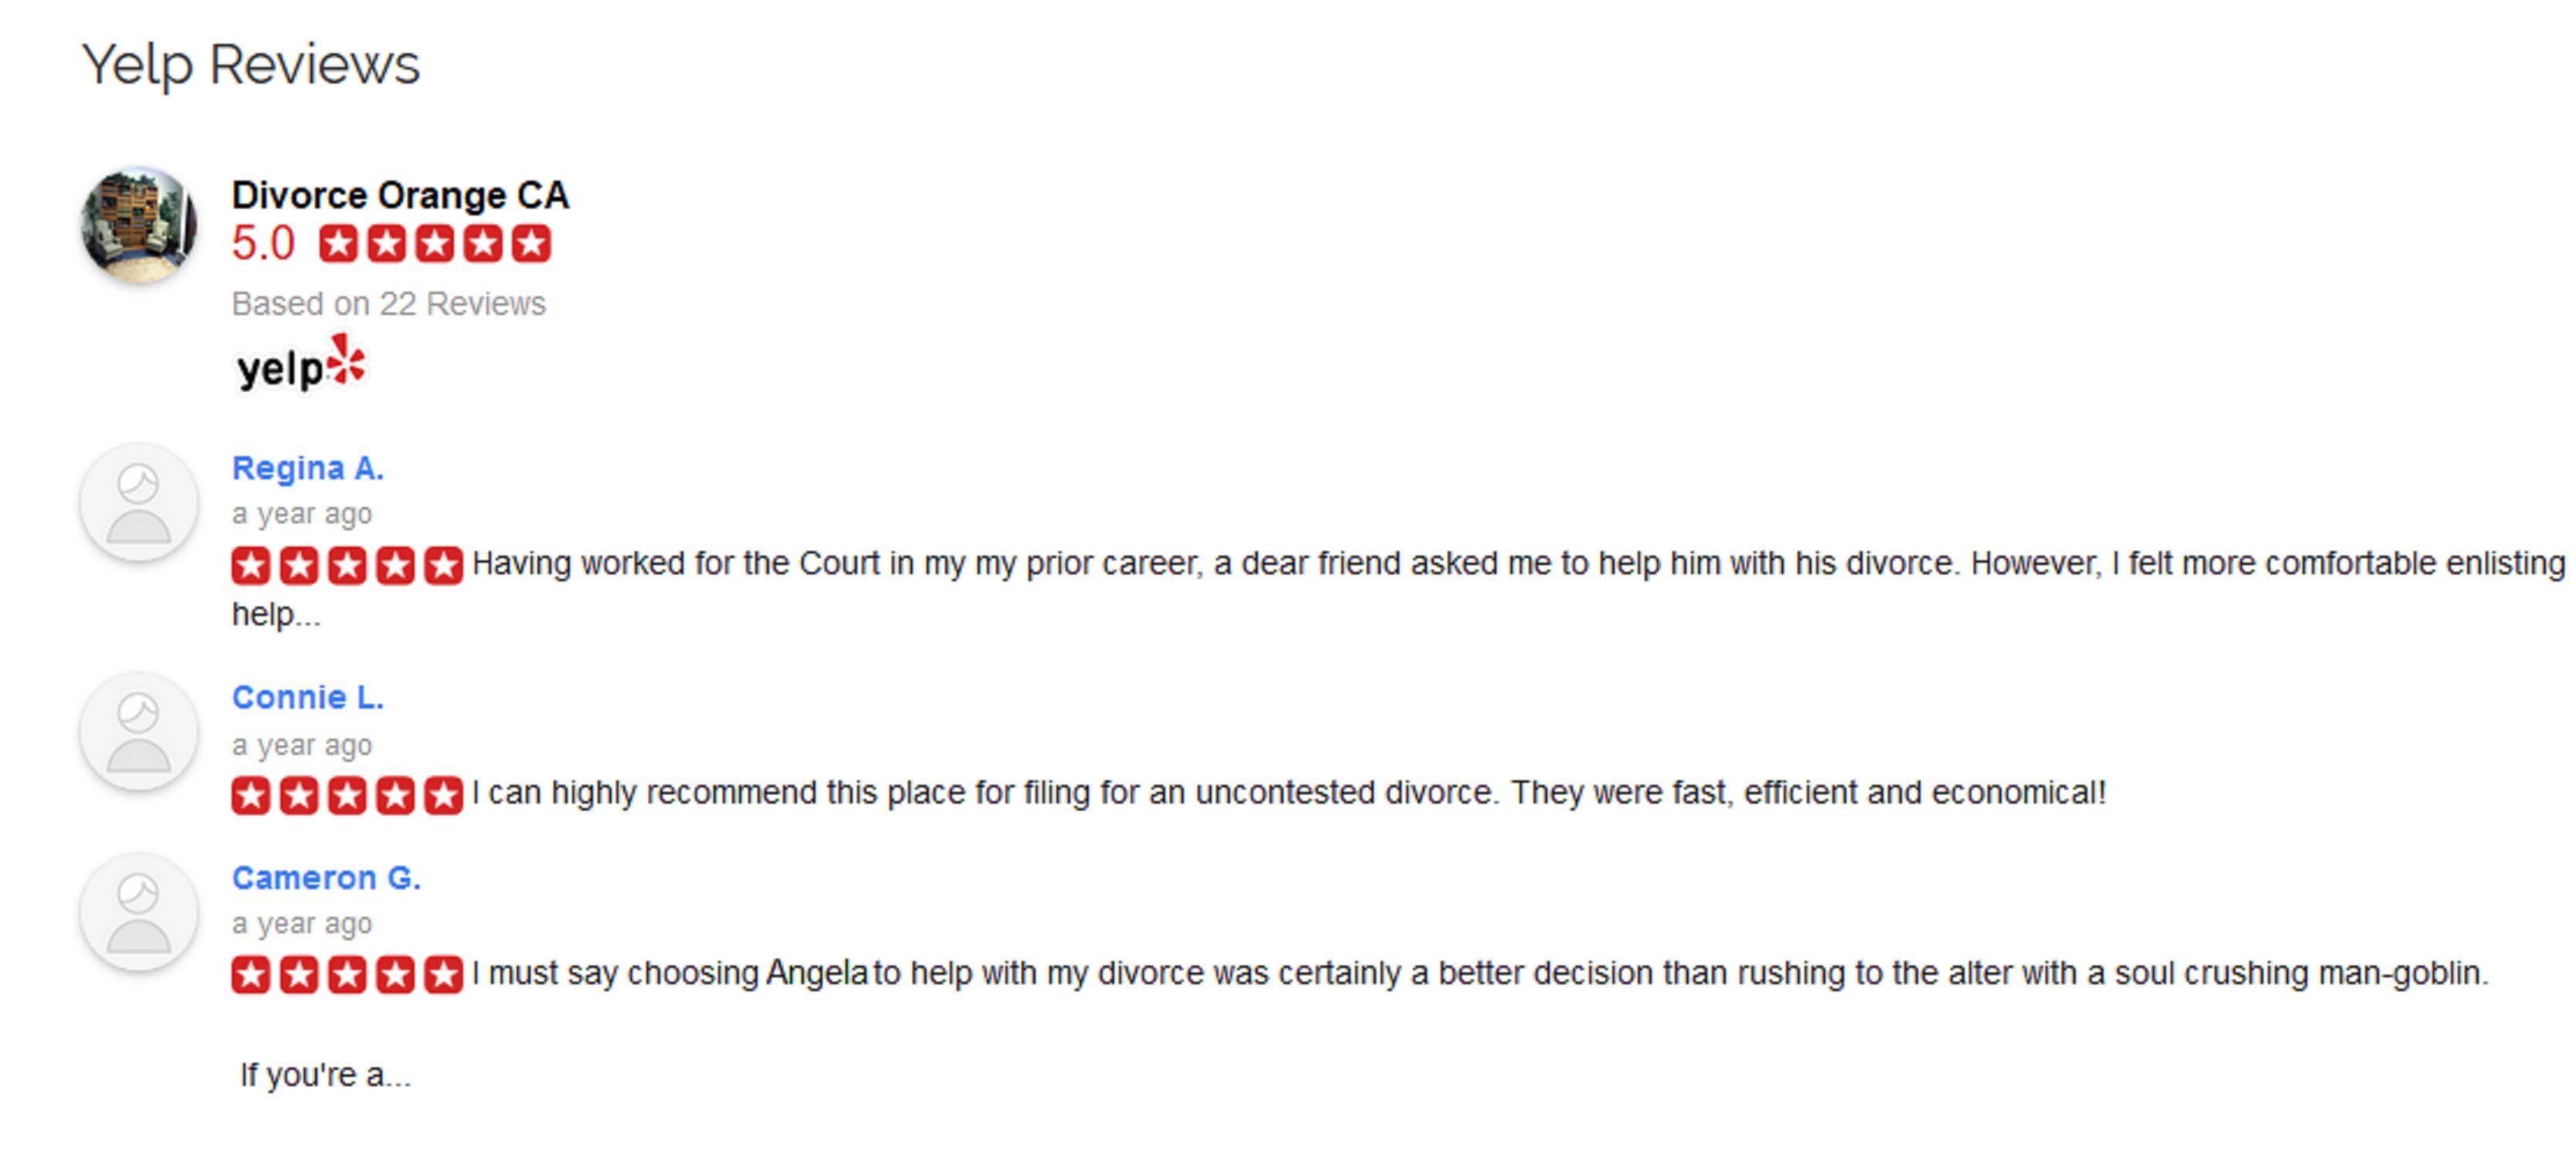 About Divorce Orange CA yelpreviewsorangeca